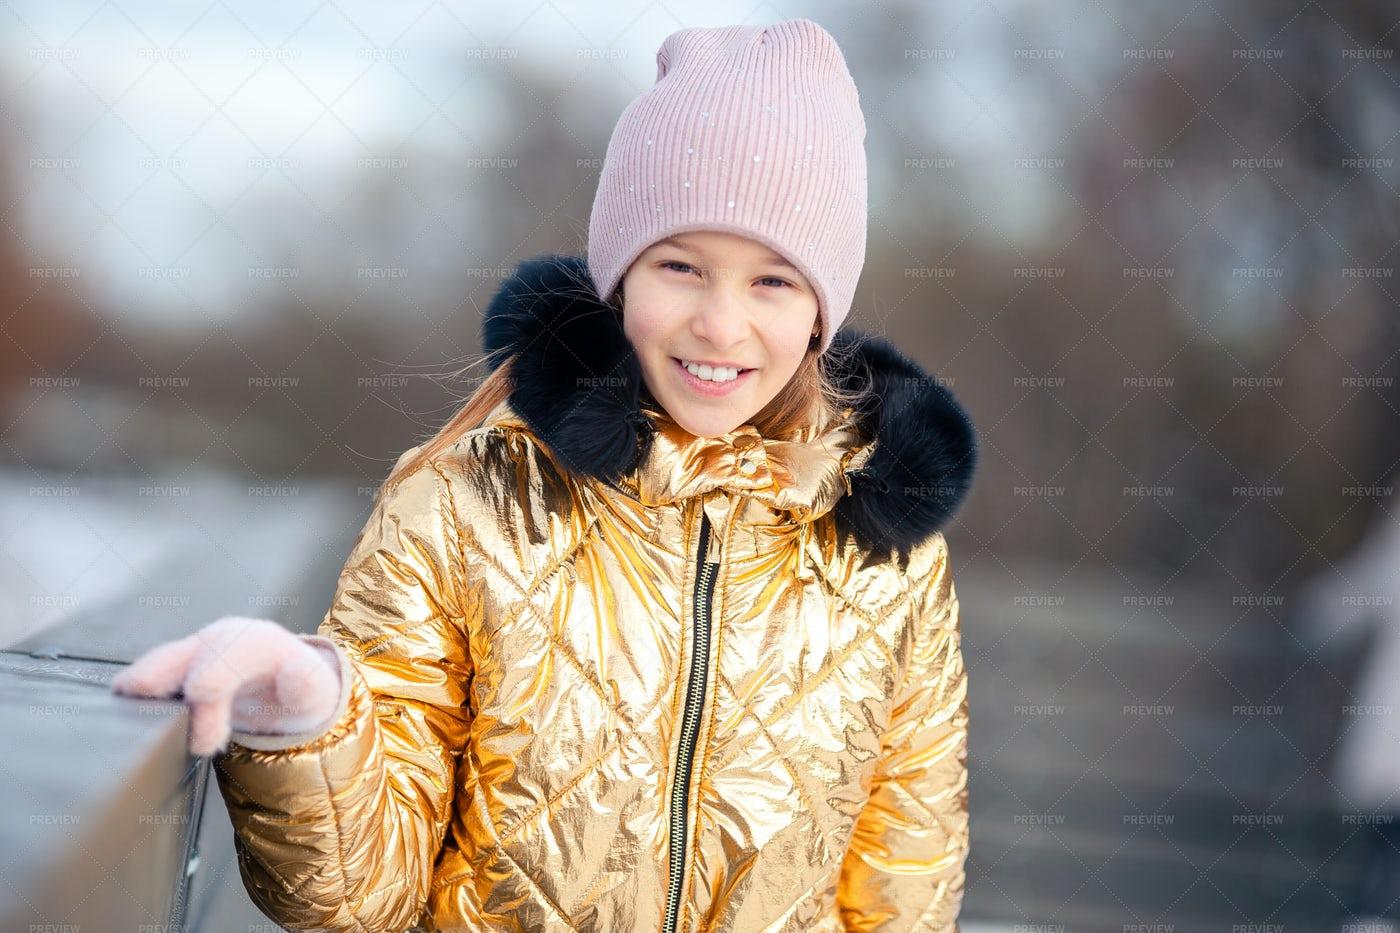 Adorable Little Girl On A Winter's Day: Stock Photos